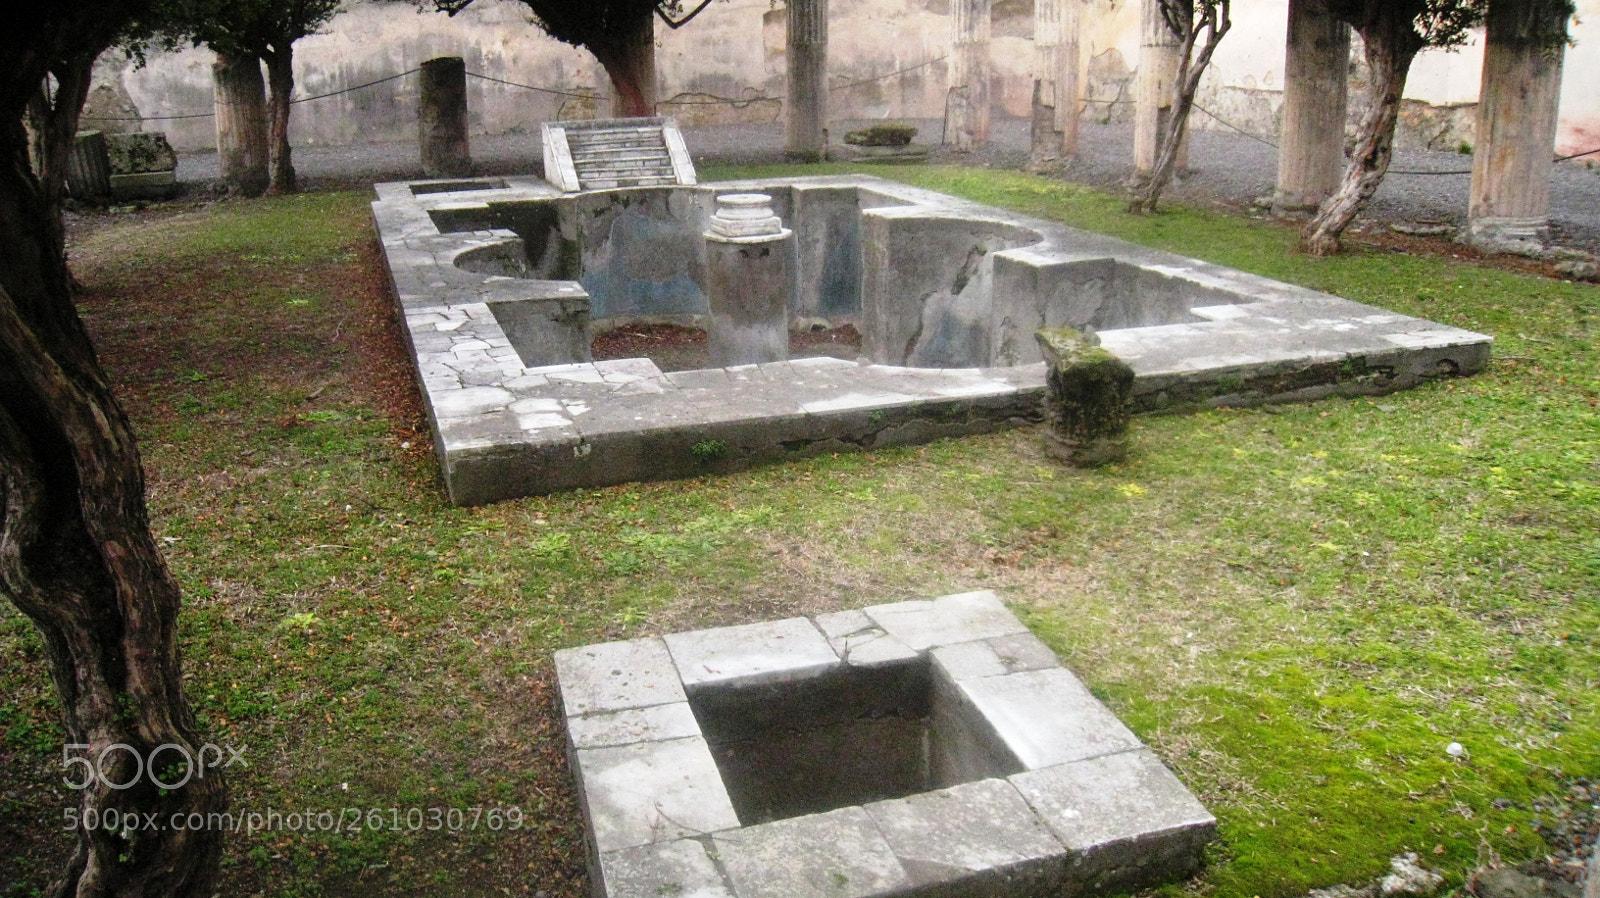 pompei, Canon DIGITAL IXUS 860 IS